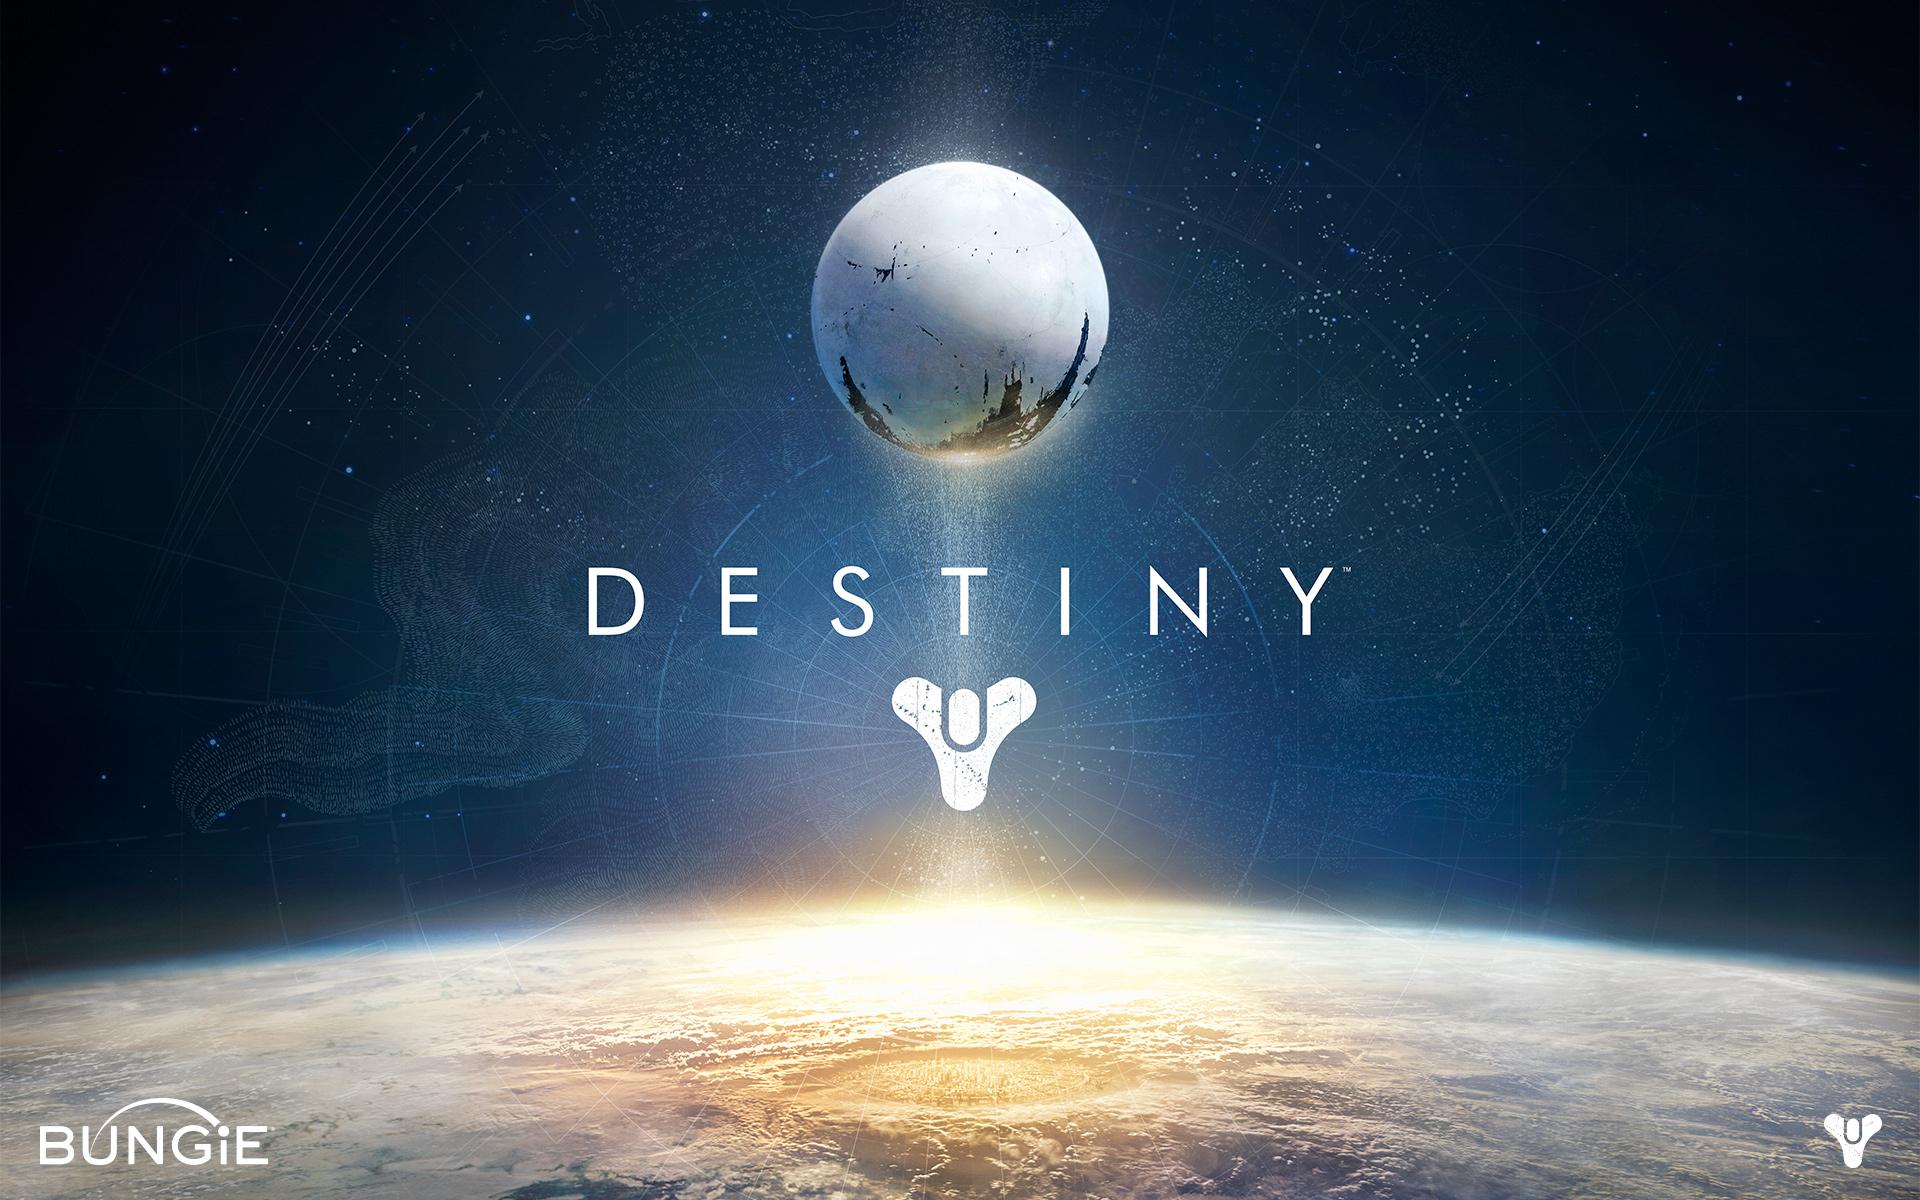 Alle Destiny codes + tool om alles snel te activeren